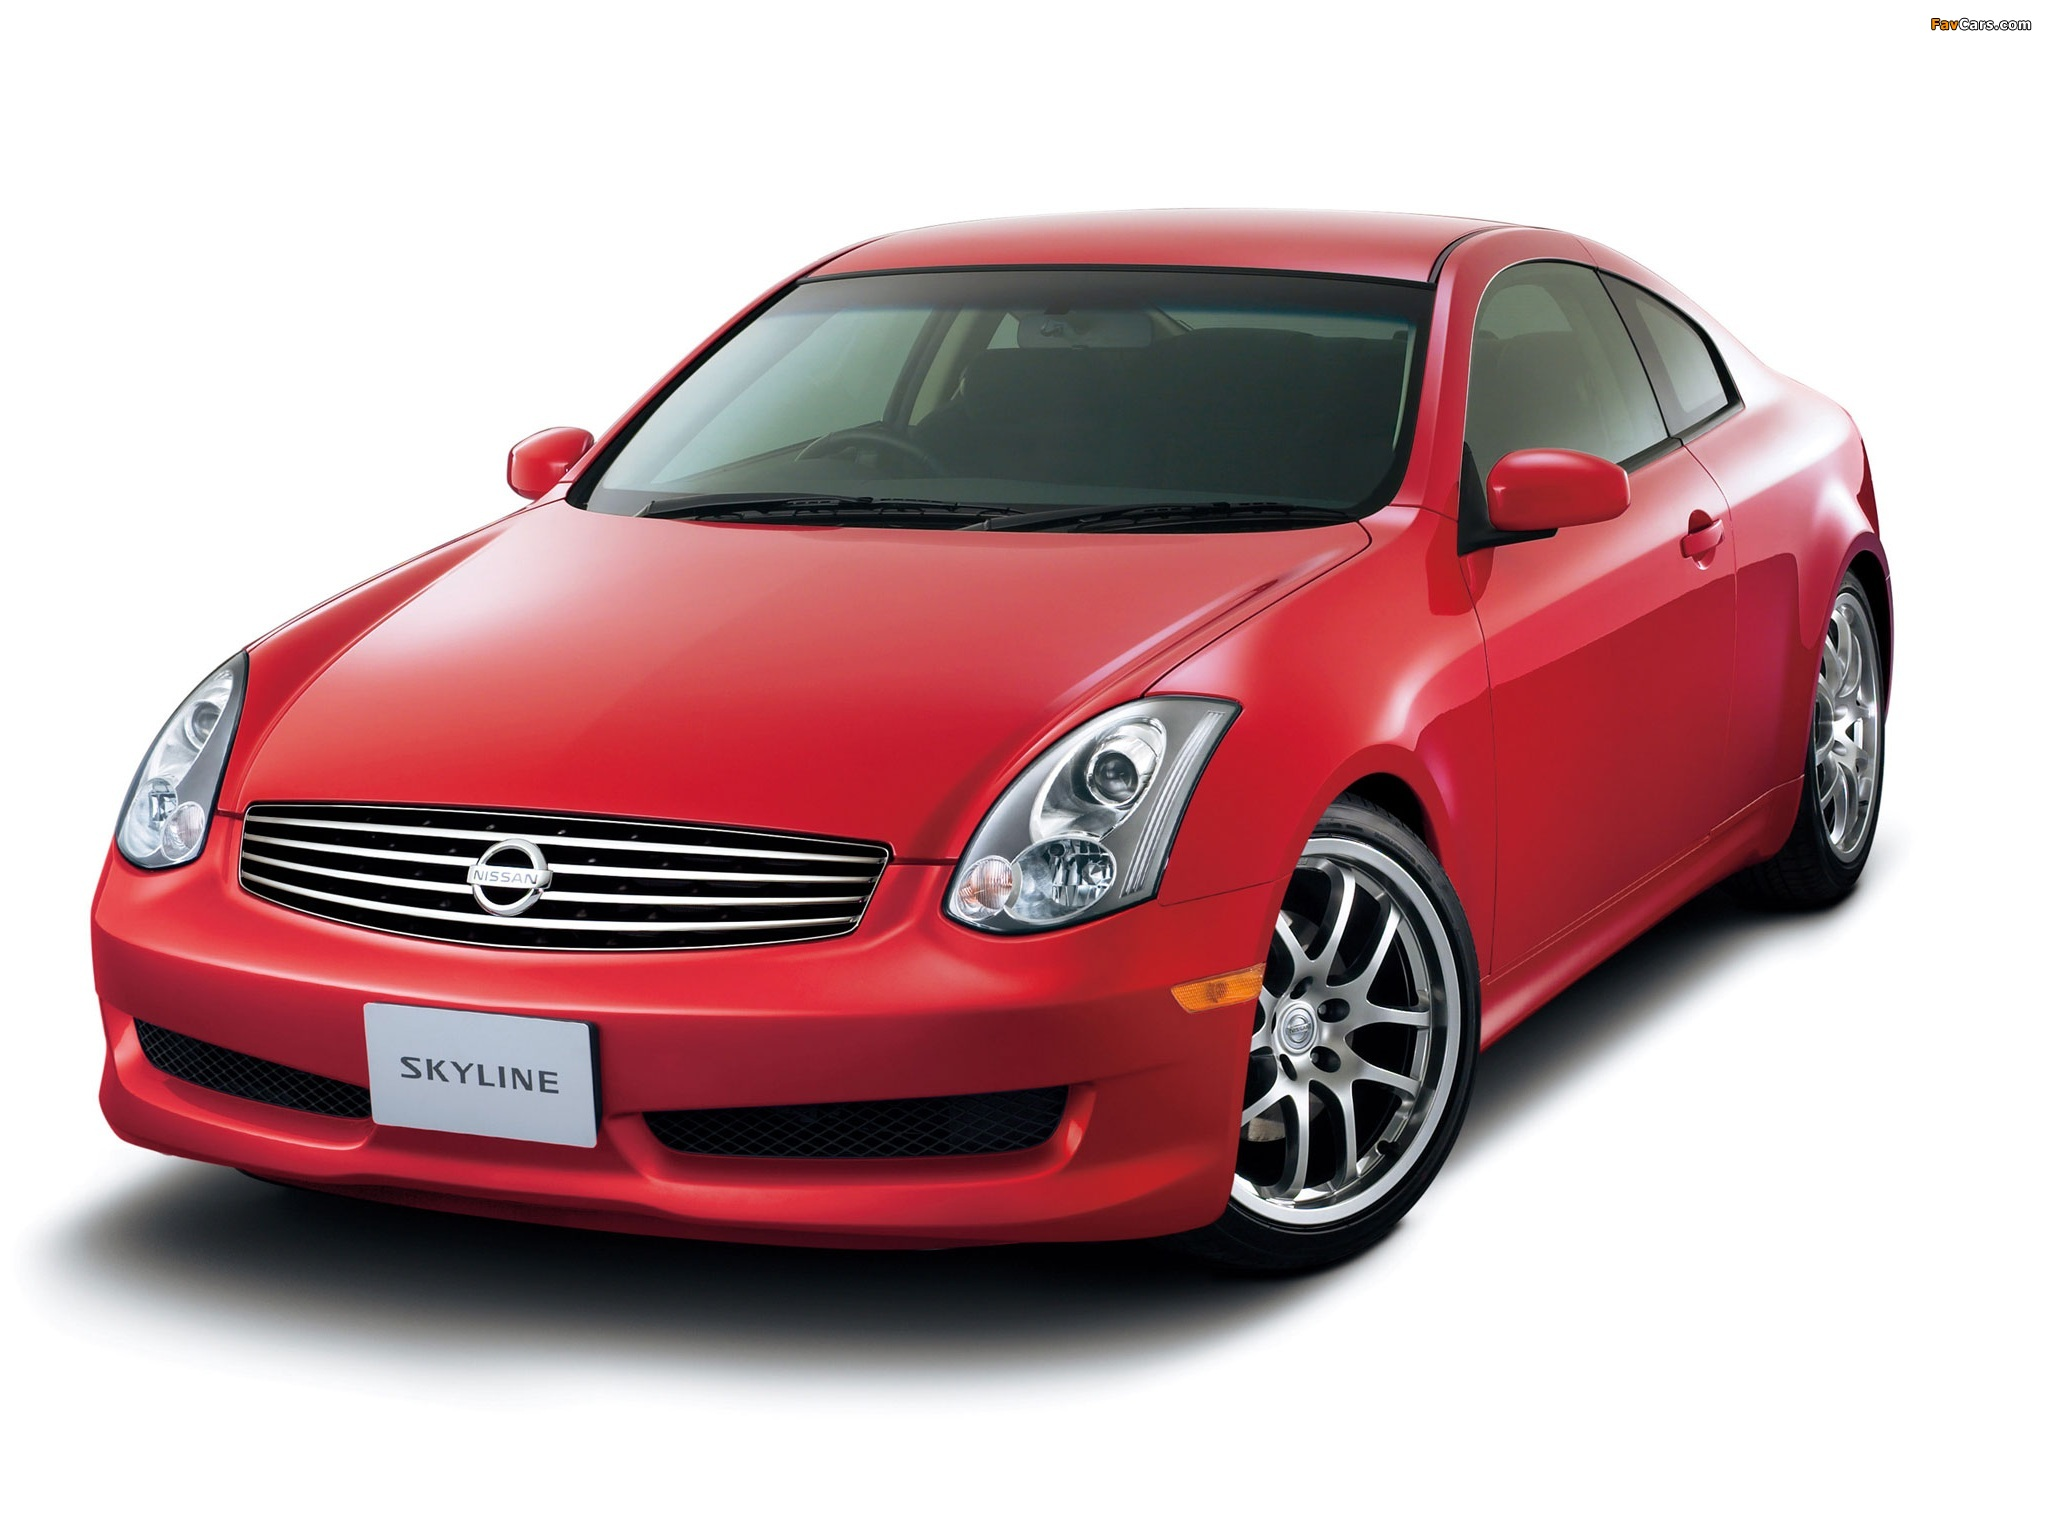 Nissan skyline coupe cv35 200307 wallpapers 2048x1536 nissan skyline coupe cv35 200307 wallpapers 2048 x 1536 vanachro Gallery